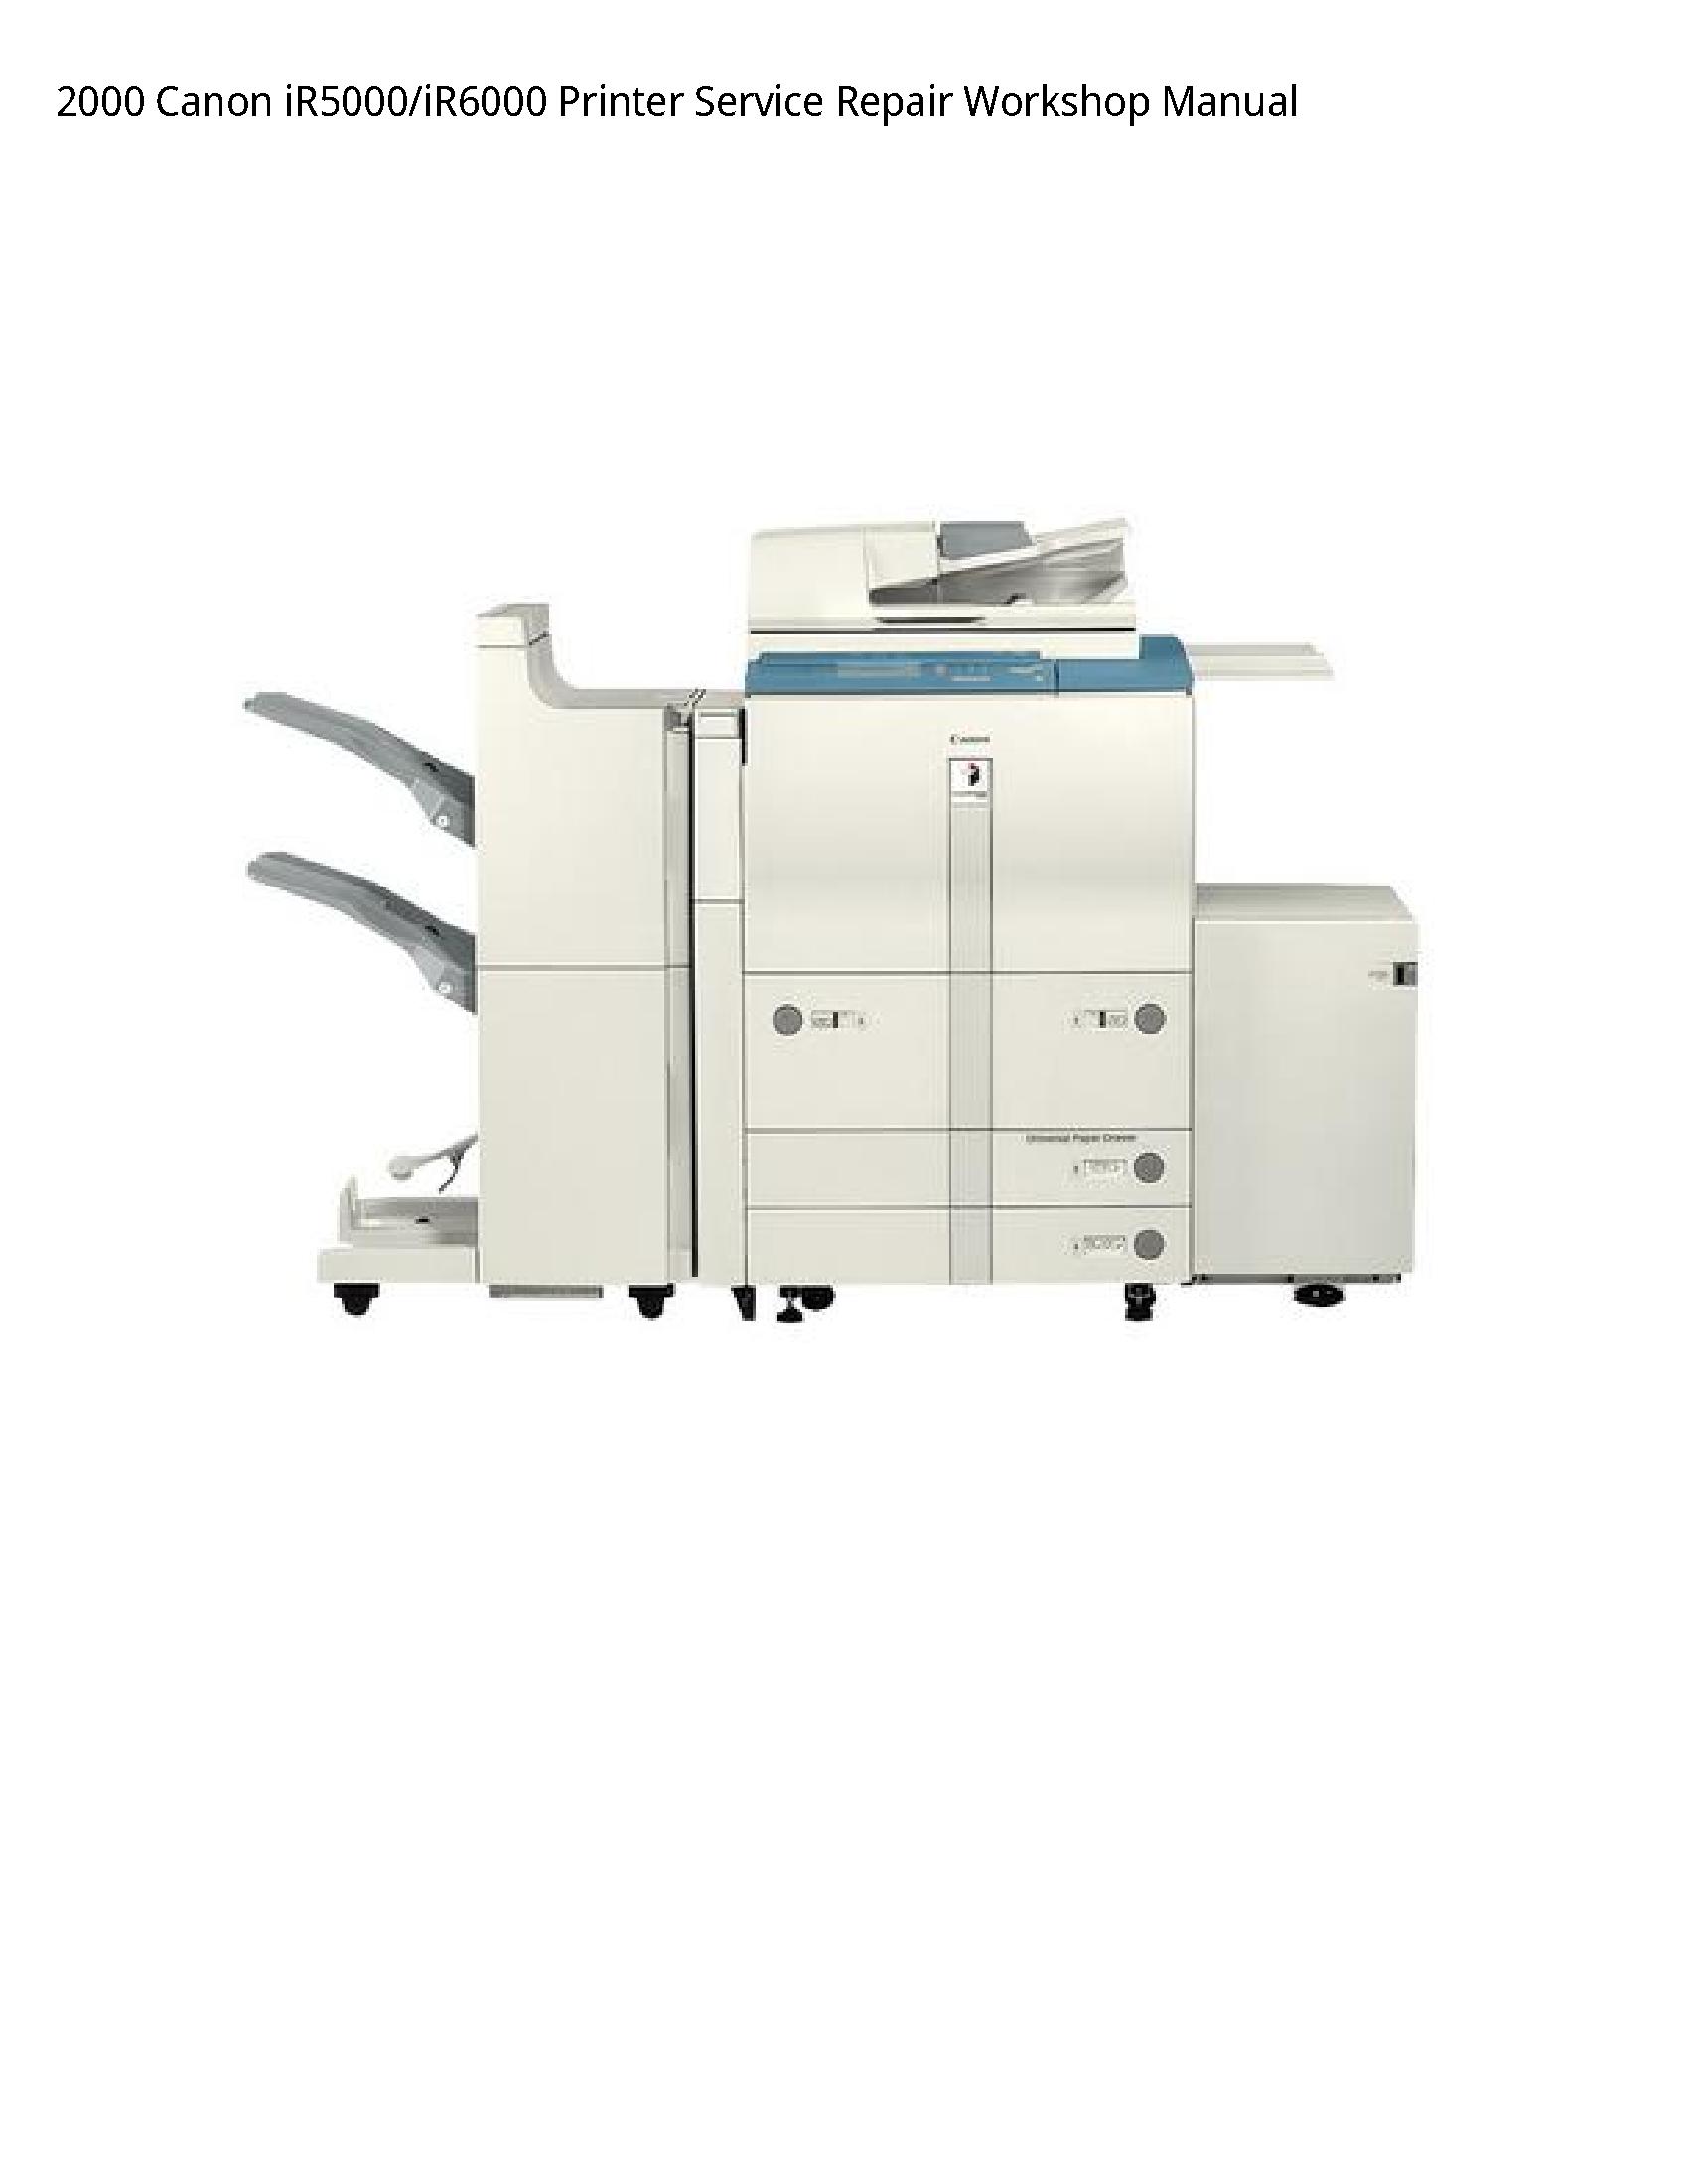 Canon iR5000 Printer manual